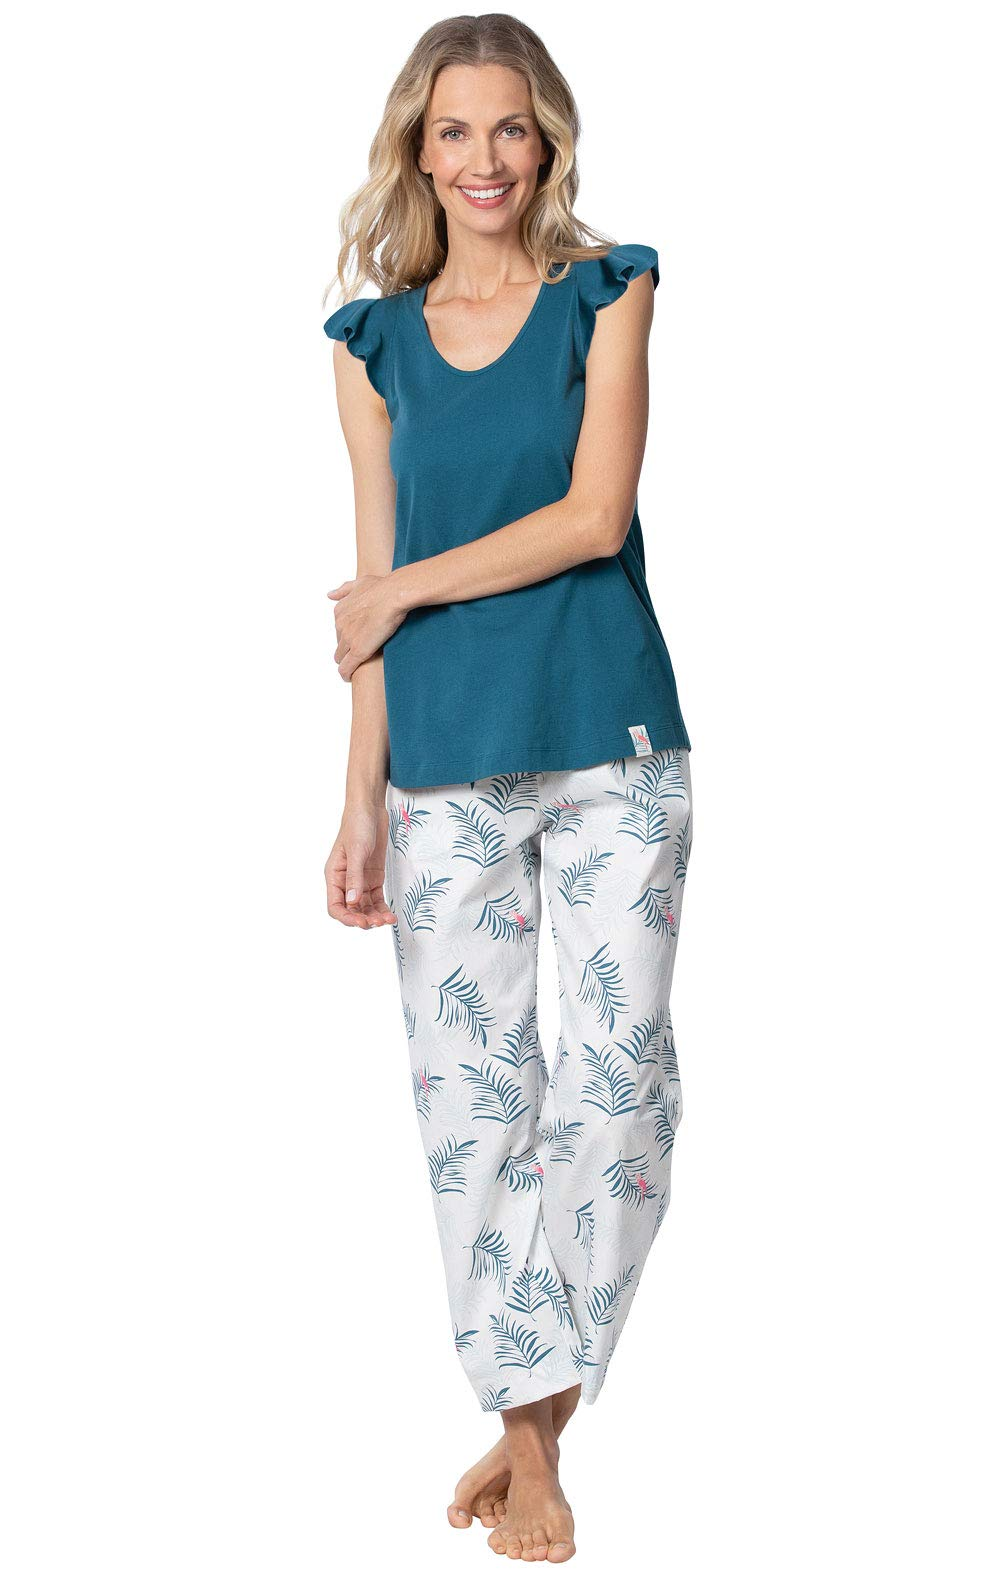 Margaritaville Capri Pajamas for Women - Summer PJs by PajamaGram, Blue, M 8-10 by PajamaGram